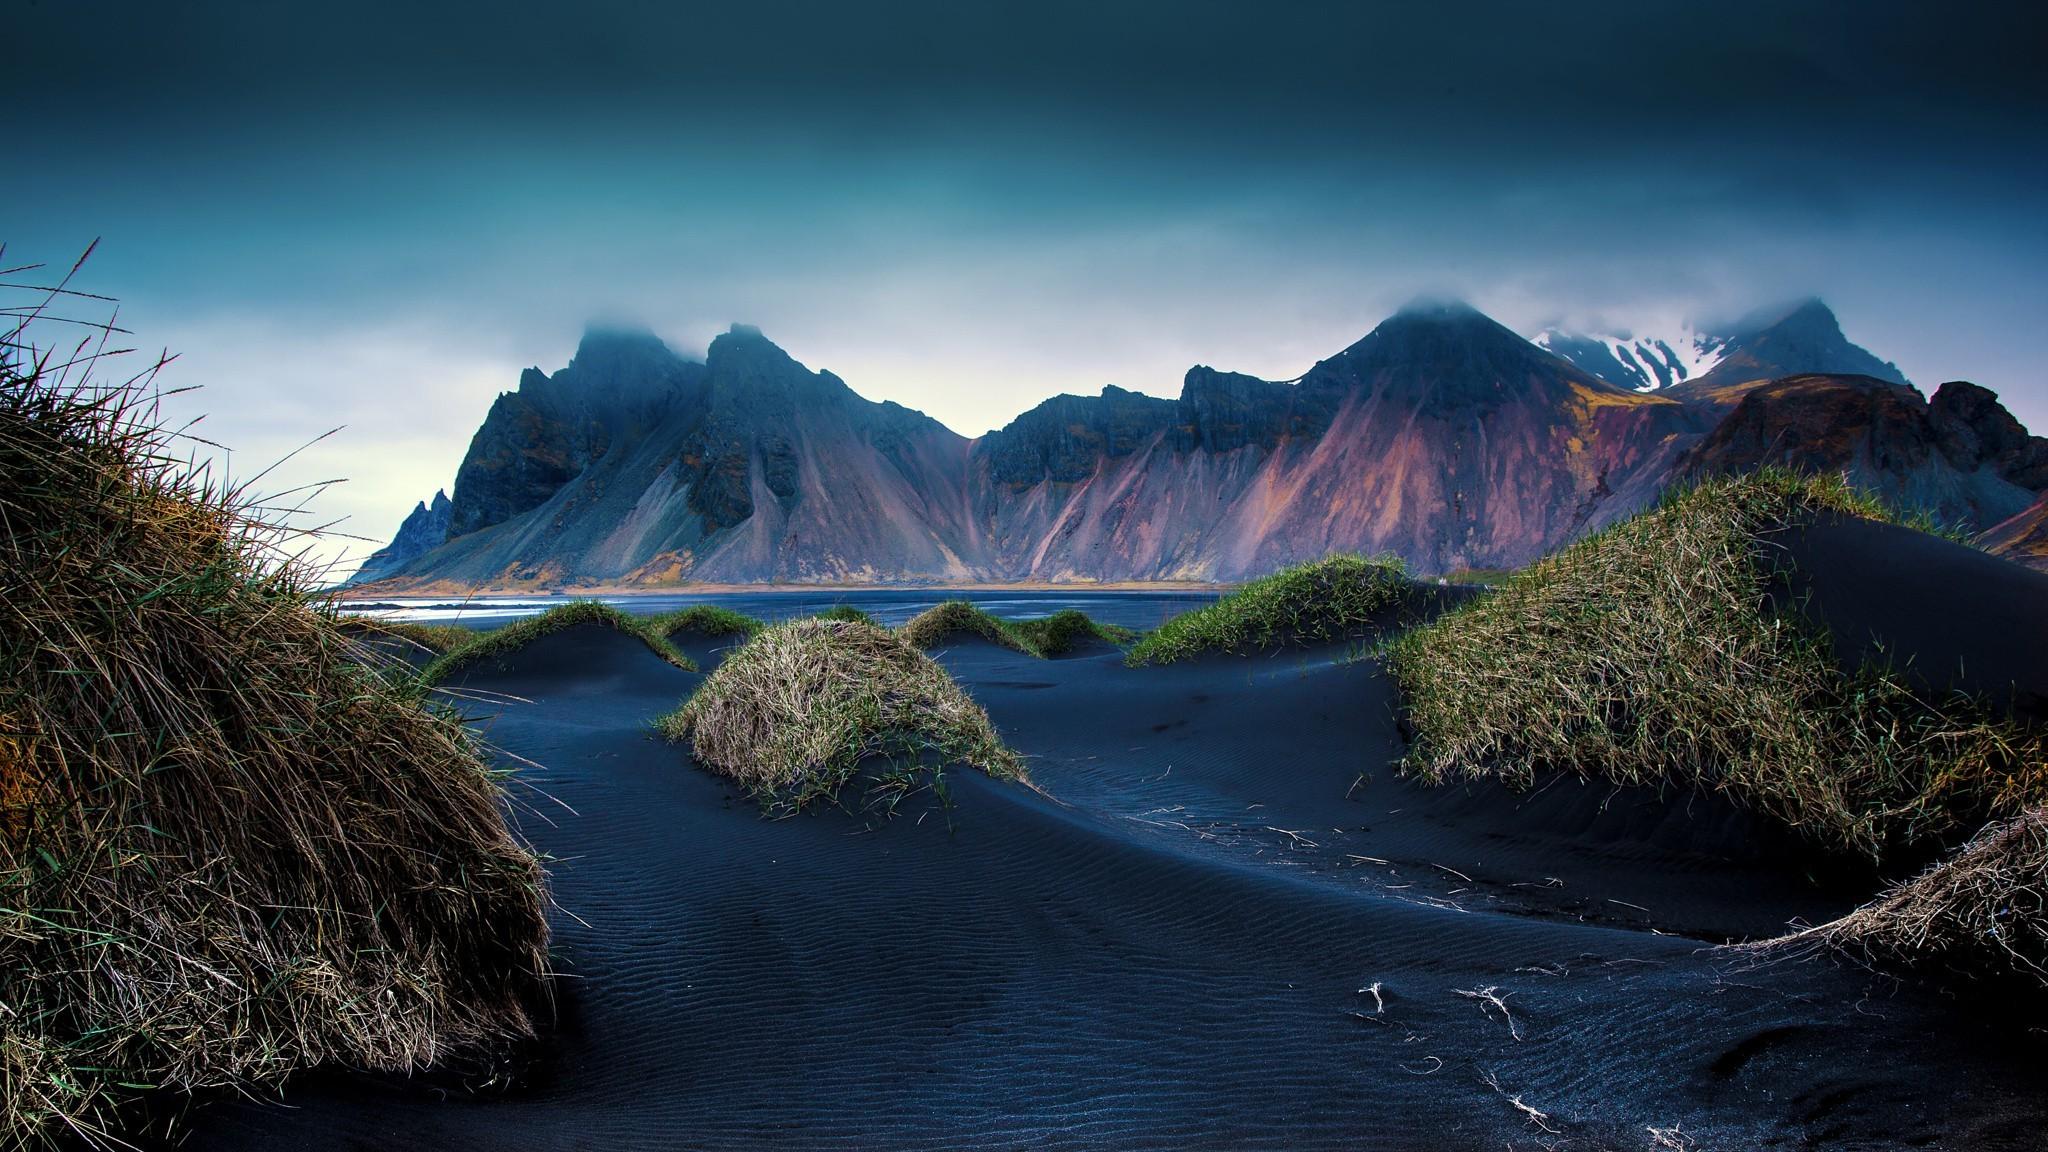 Islande Dunes De Sable Noir Fond D Ecran Nature Noire 2048x1152 Wallpapertip